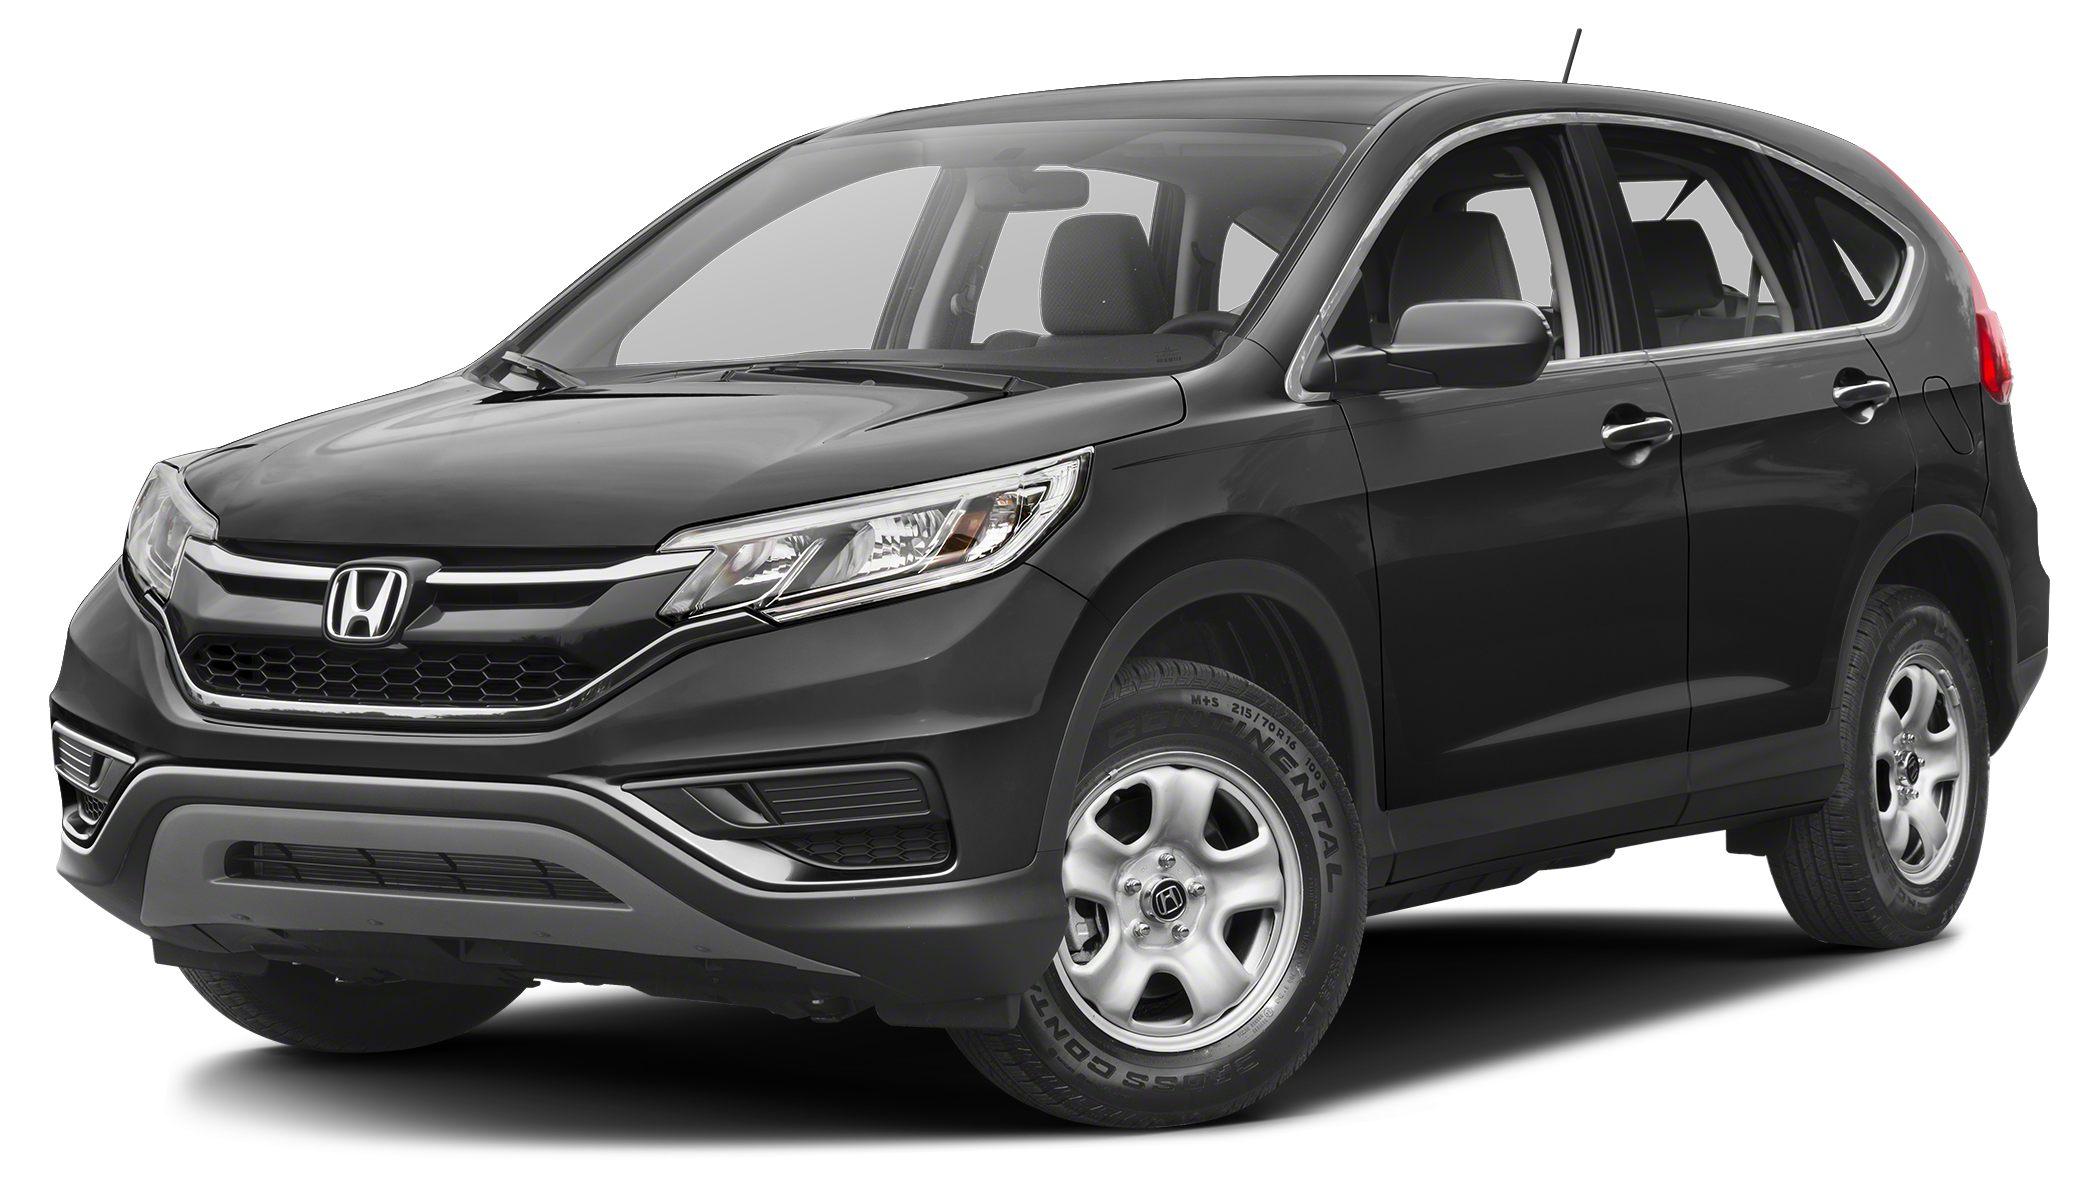 2016 Honda CR-V LX Buy a new Honda from Diamond Valley Honda in Hemet and obtain Lifetime Oil Chan